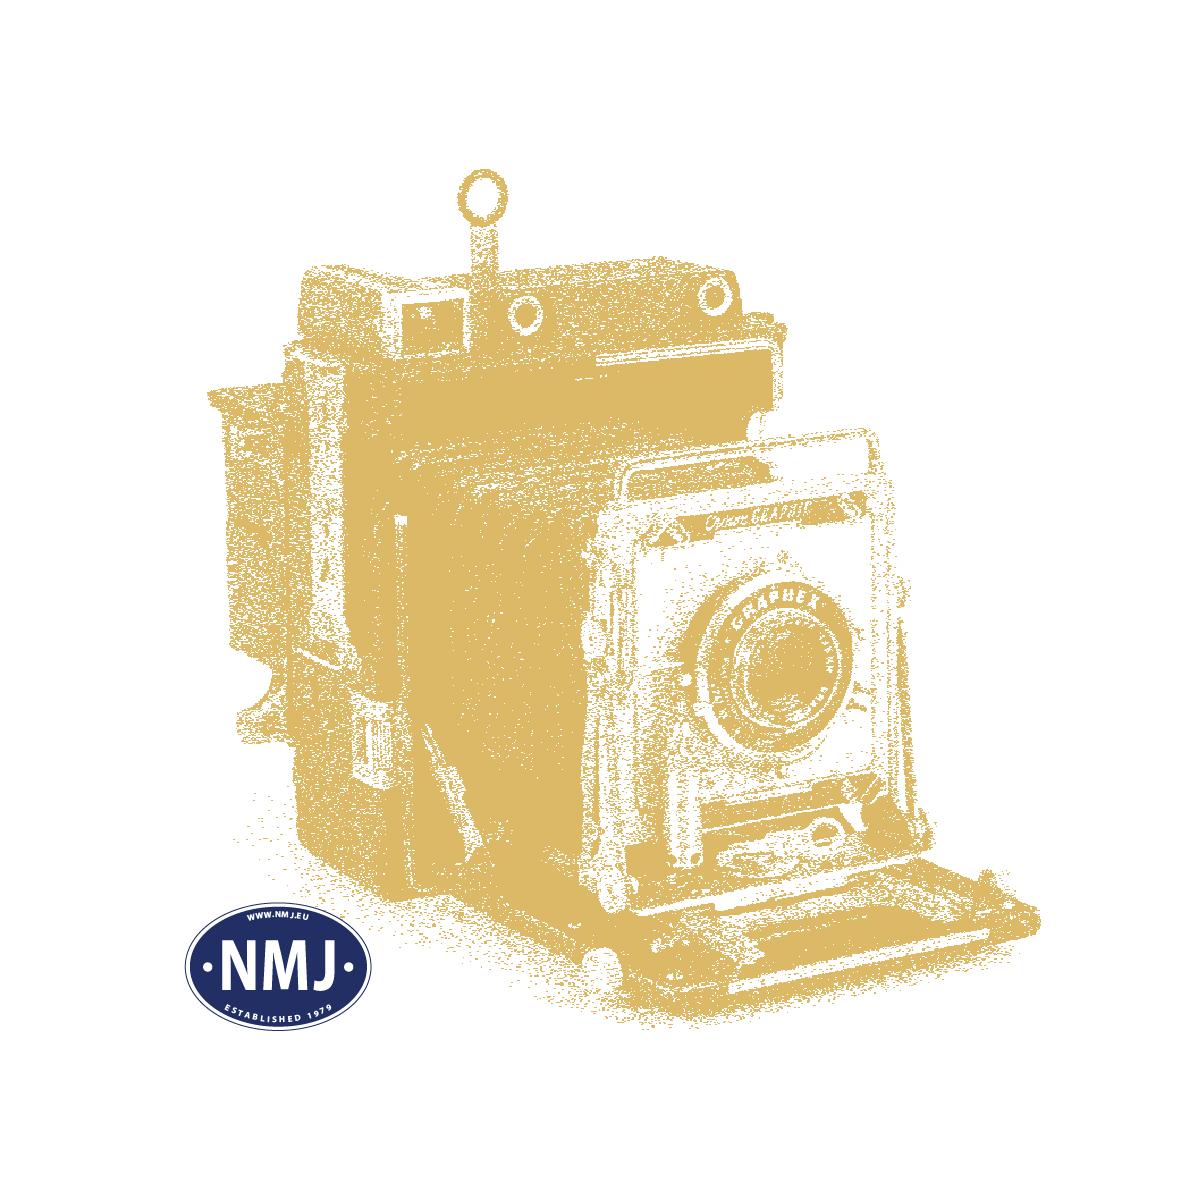 DK-8750072 - PBS Mx 1030, DCC Digital